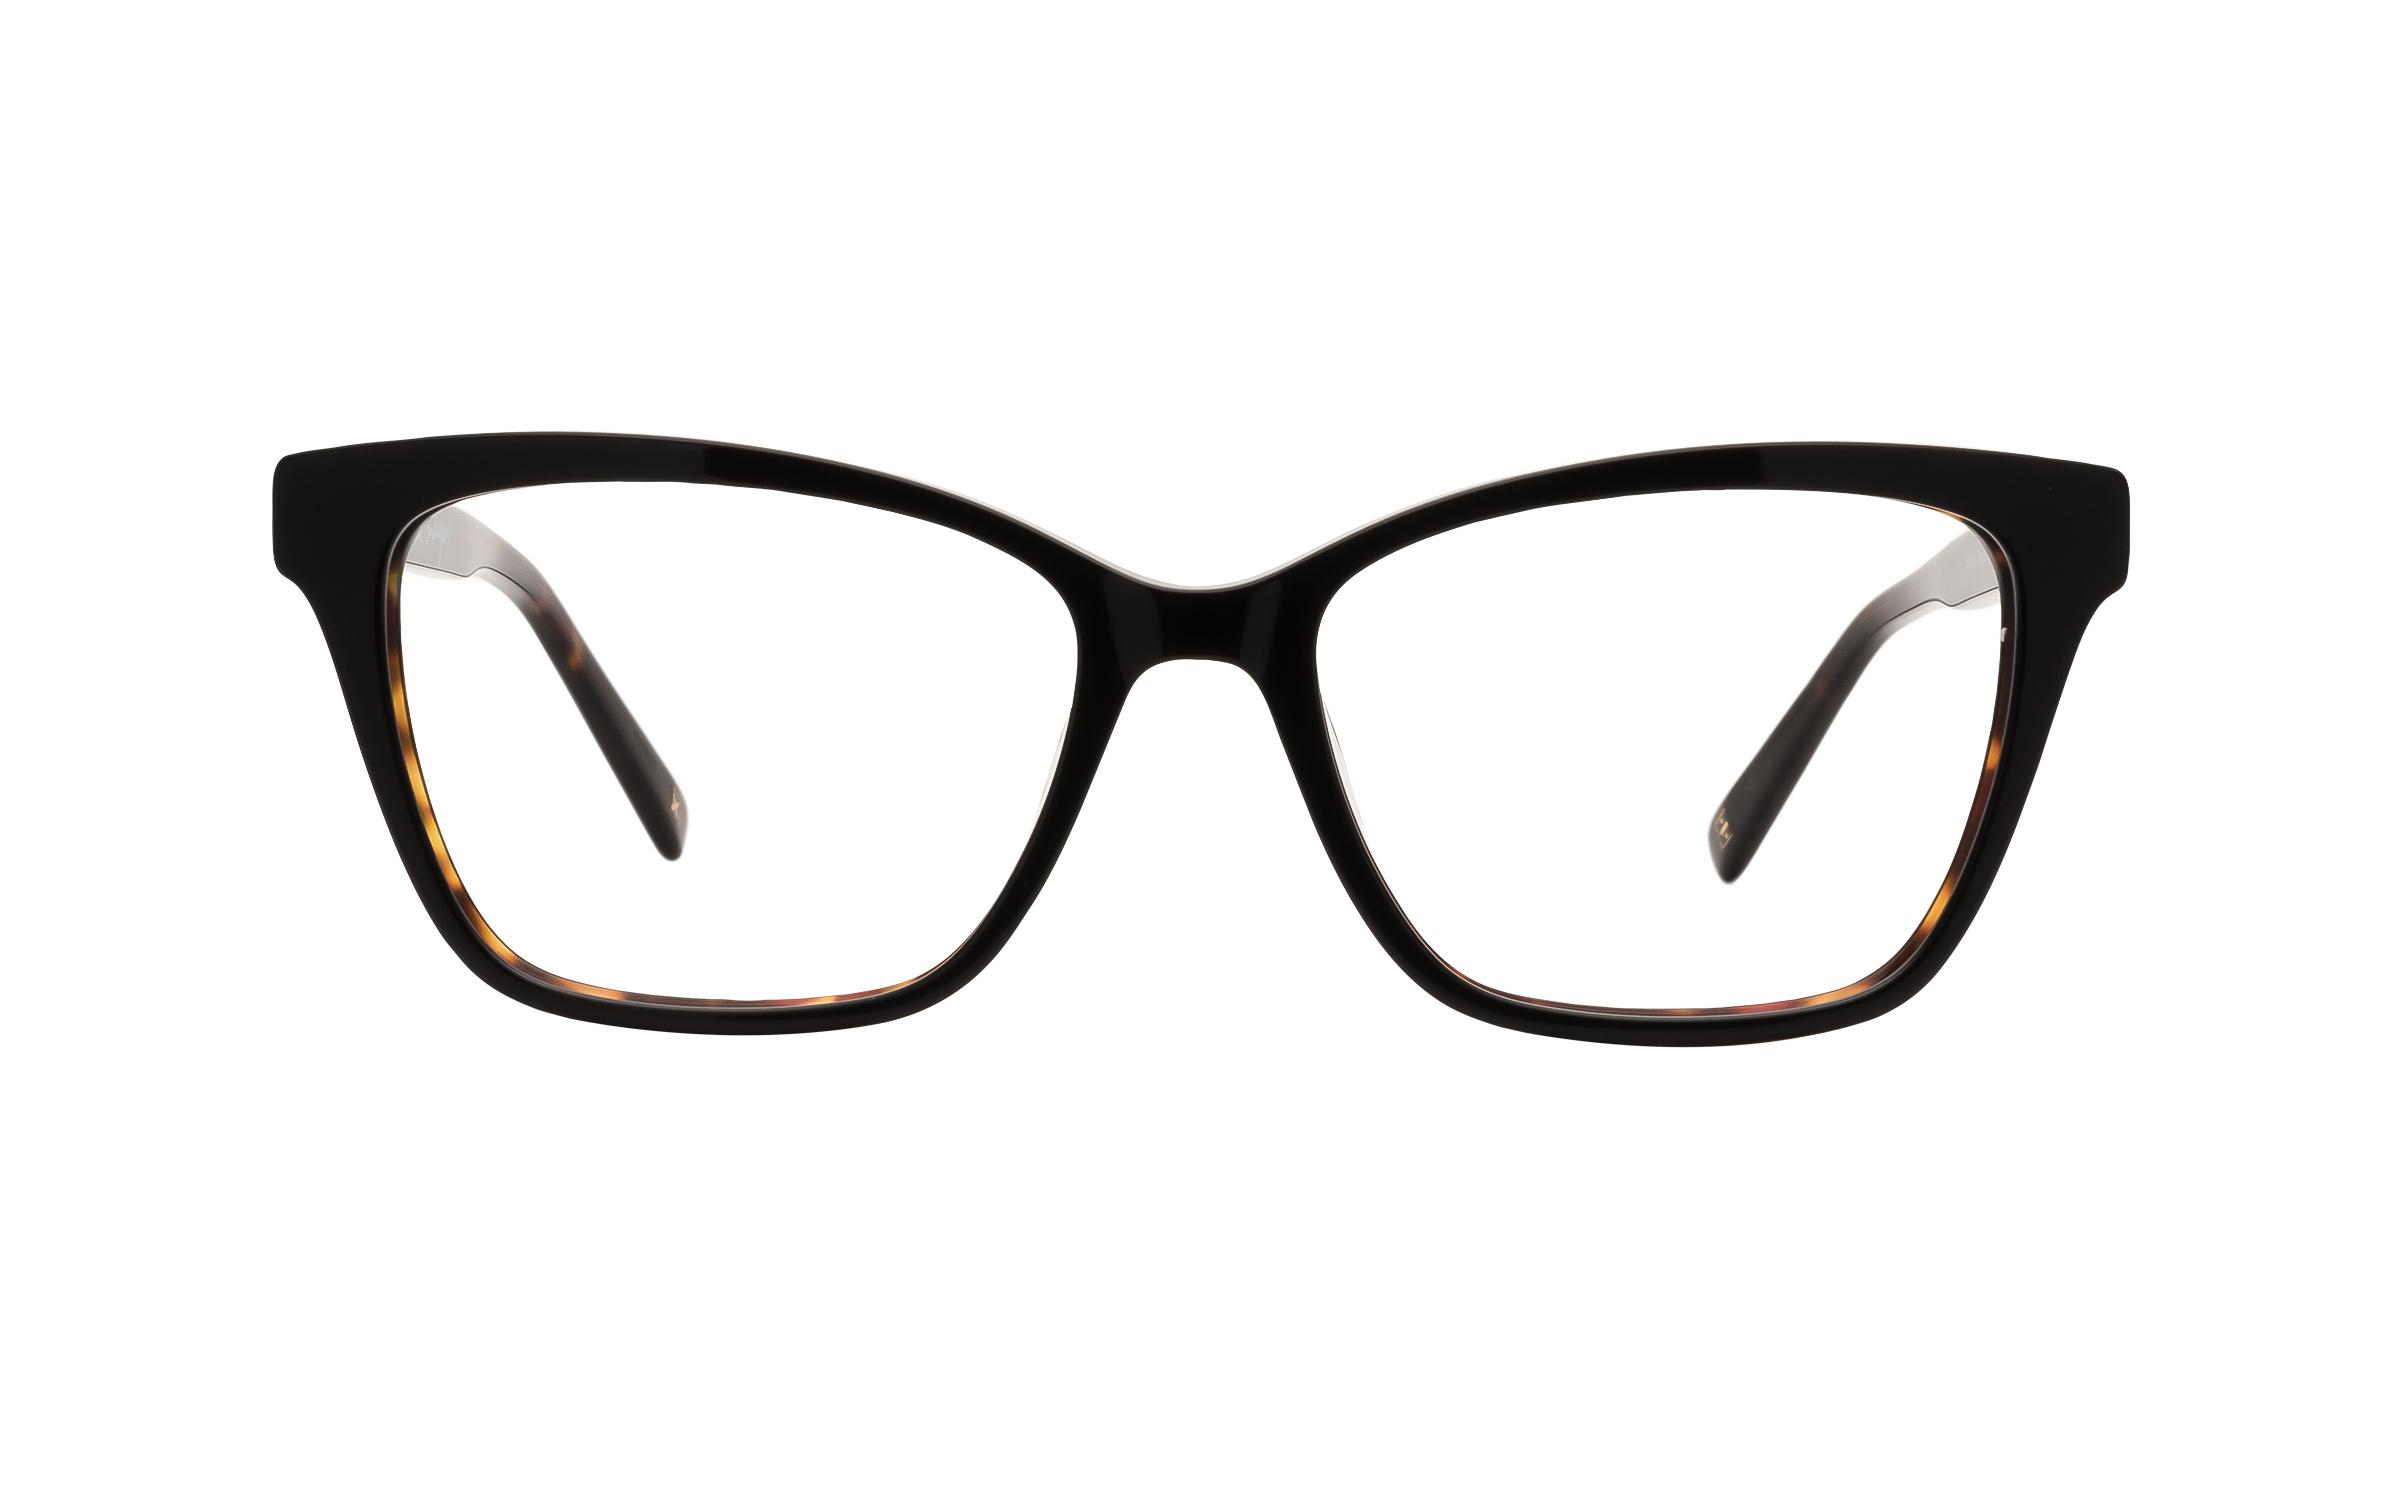 Derek_Cardigan_Womens_Glasses_DFrame_Black_Acetate_Online_Coastal